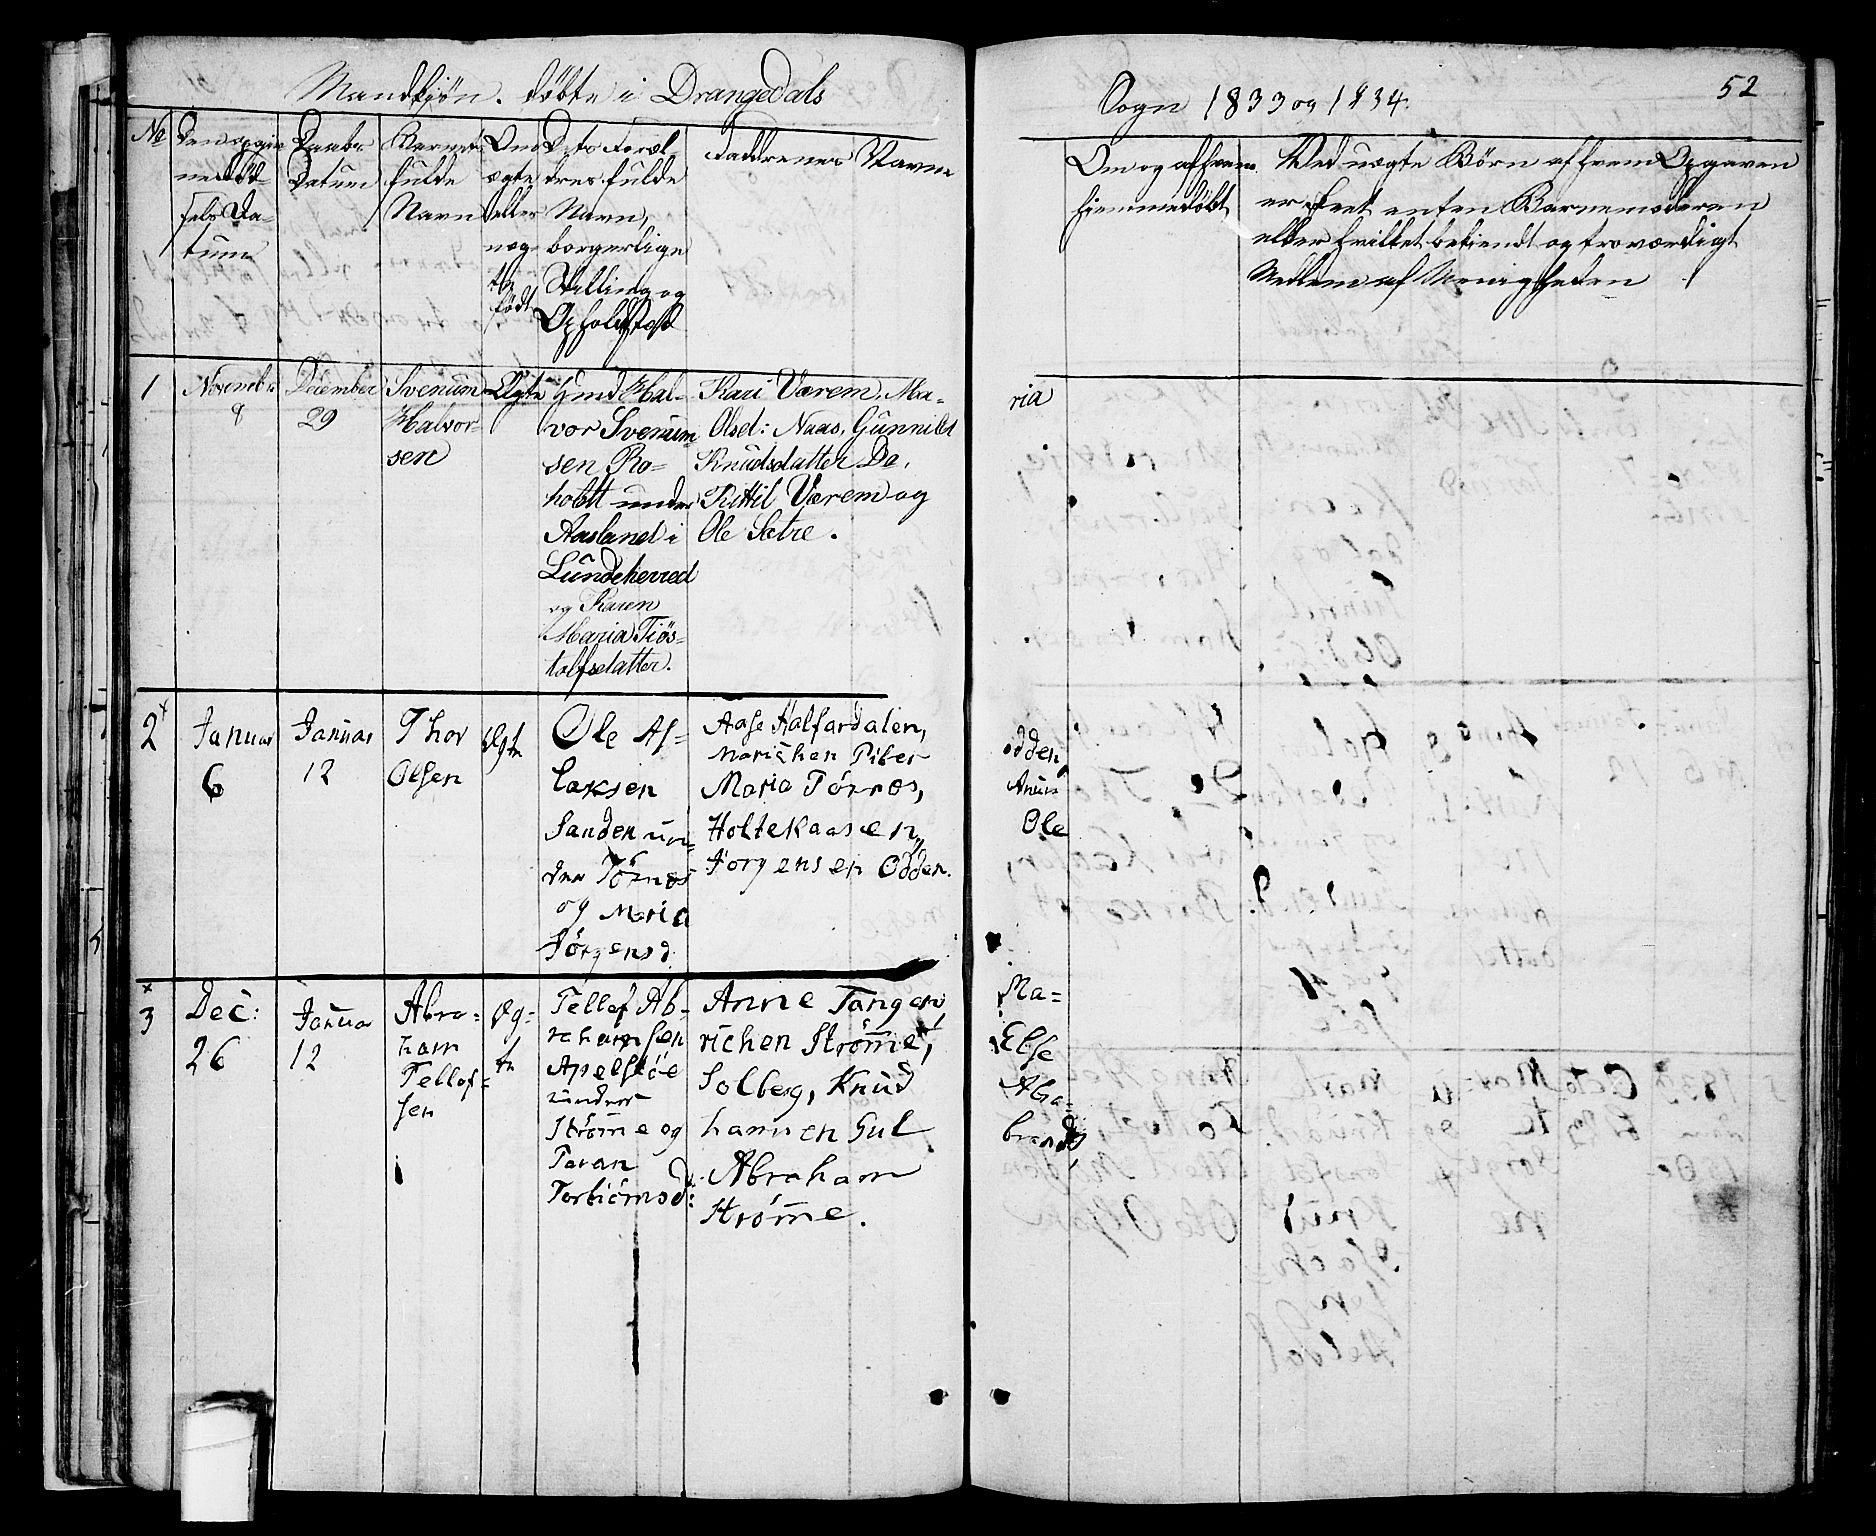 SAKO, Drangedal kirkebøker, F/Fa/L0006: Ministerialbok nr. 6, 1831-1837, s. 52